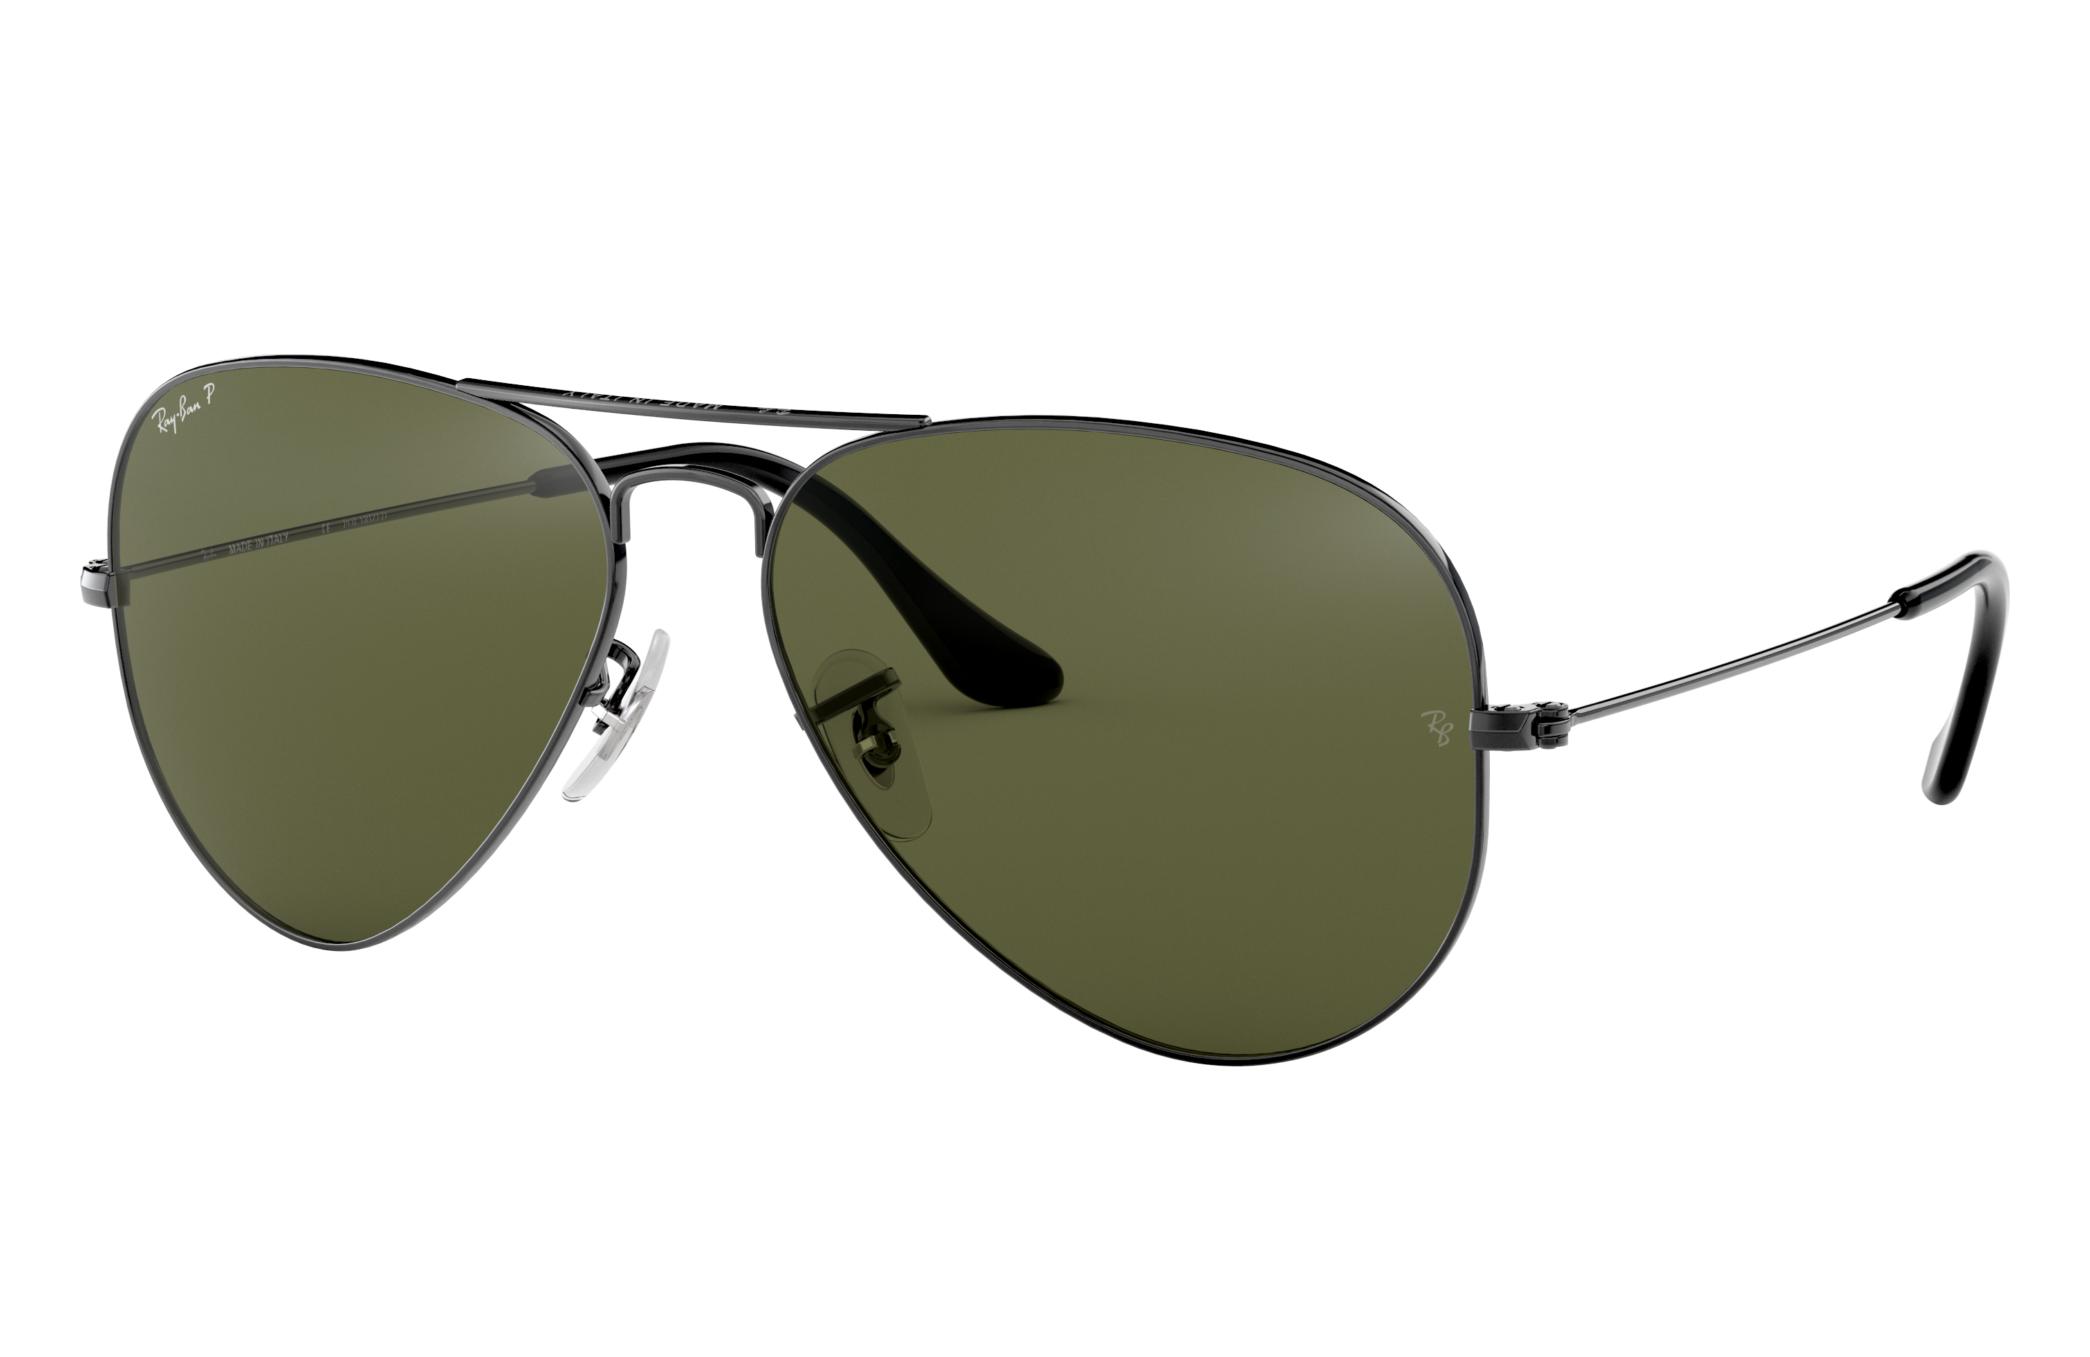 Ray-Ban Aviator Classic Gunmetal, Polarized Green Lenses - RB3025